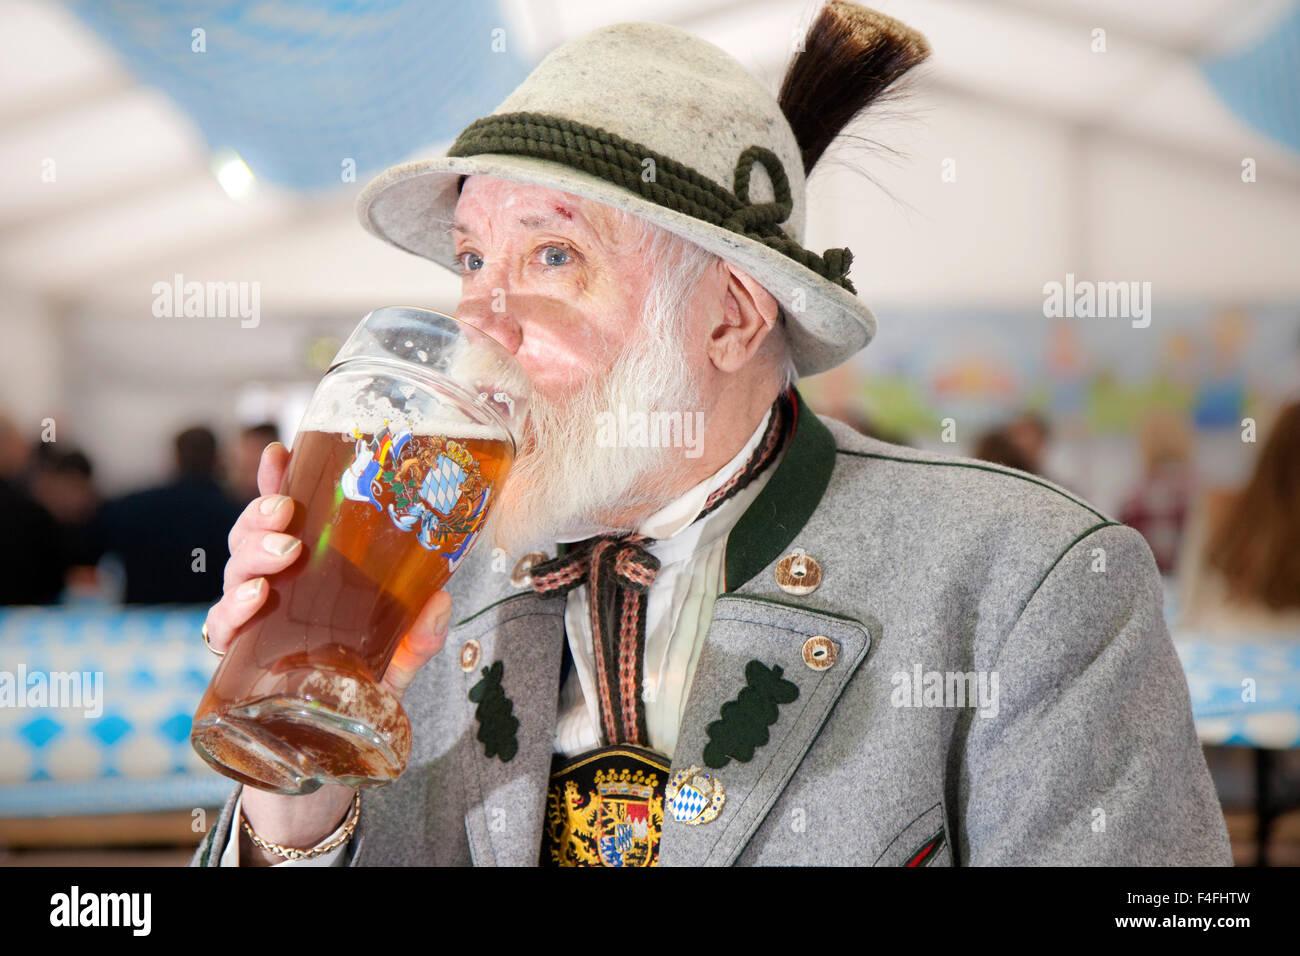 Liverpool, Merseyside, Uk. 17 Oct 2015.  Jack Hans Dieter Sherlock who was born in 1947 of German ancestry, happily - Stock Image